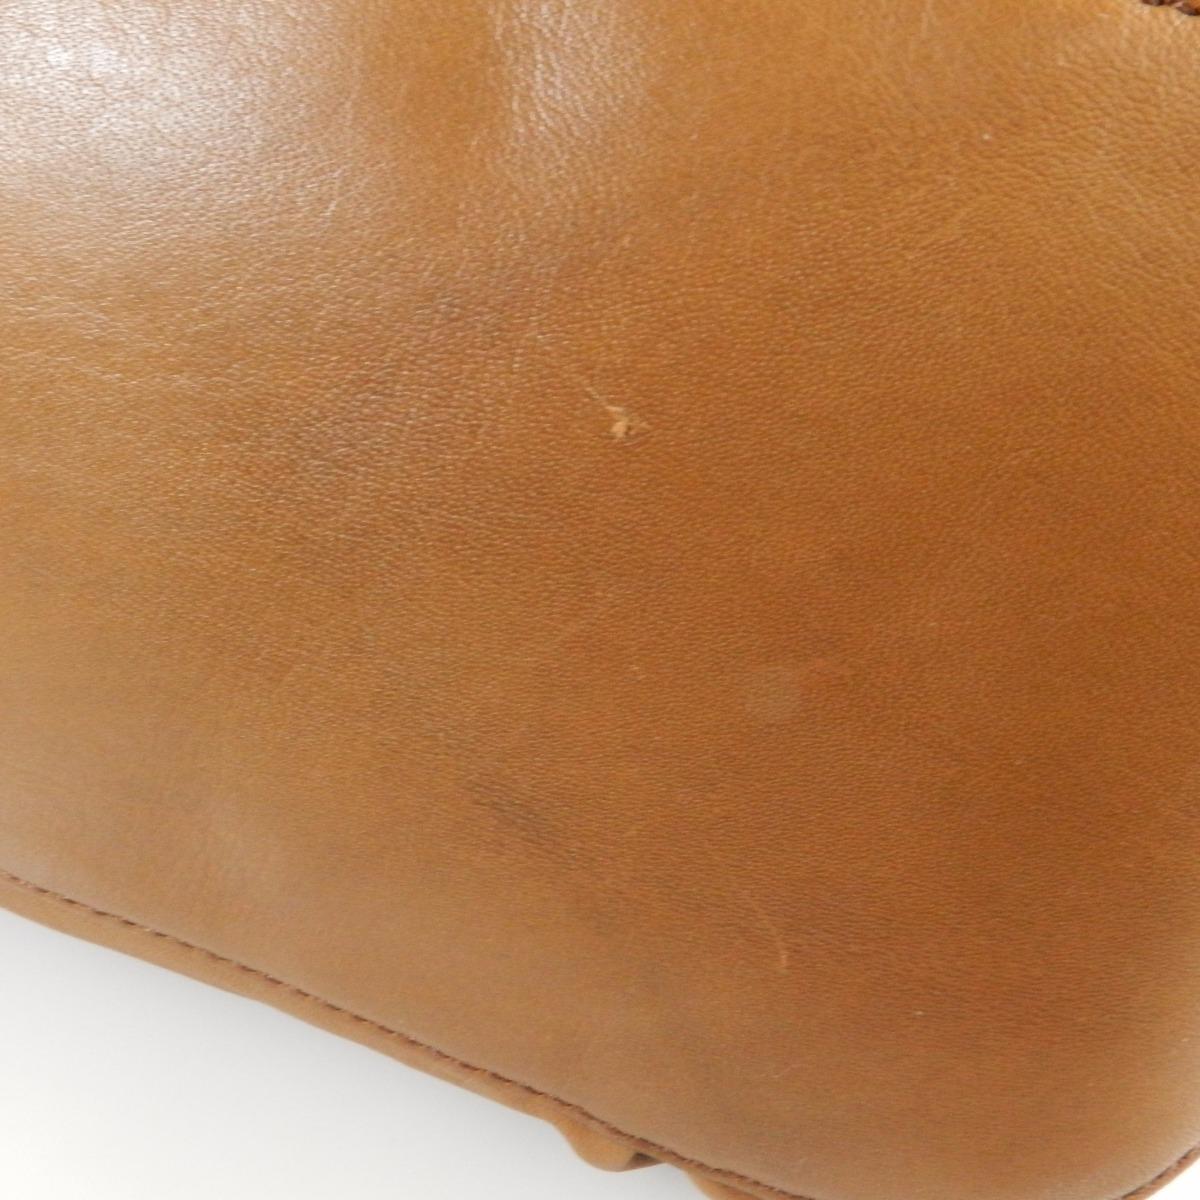 Authentic Cole Haan  Belt design Handbag Leather